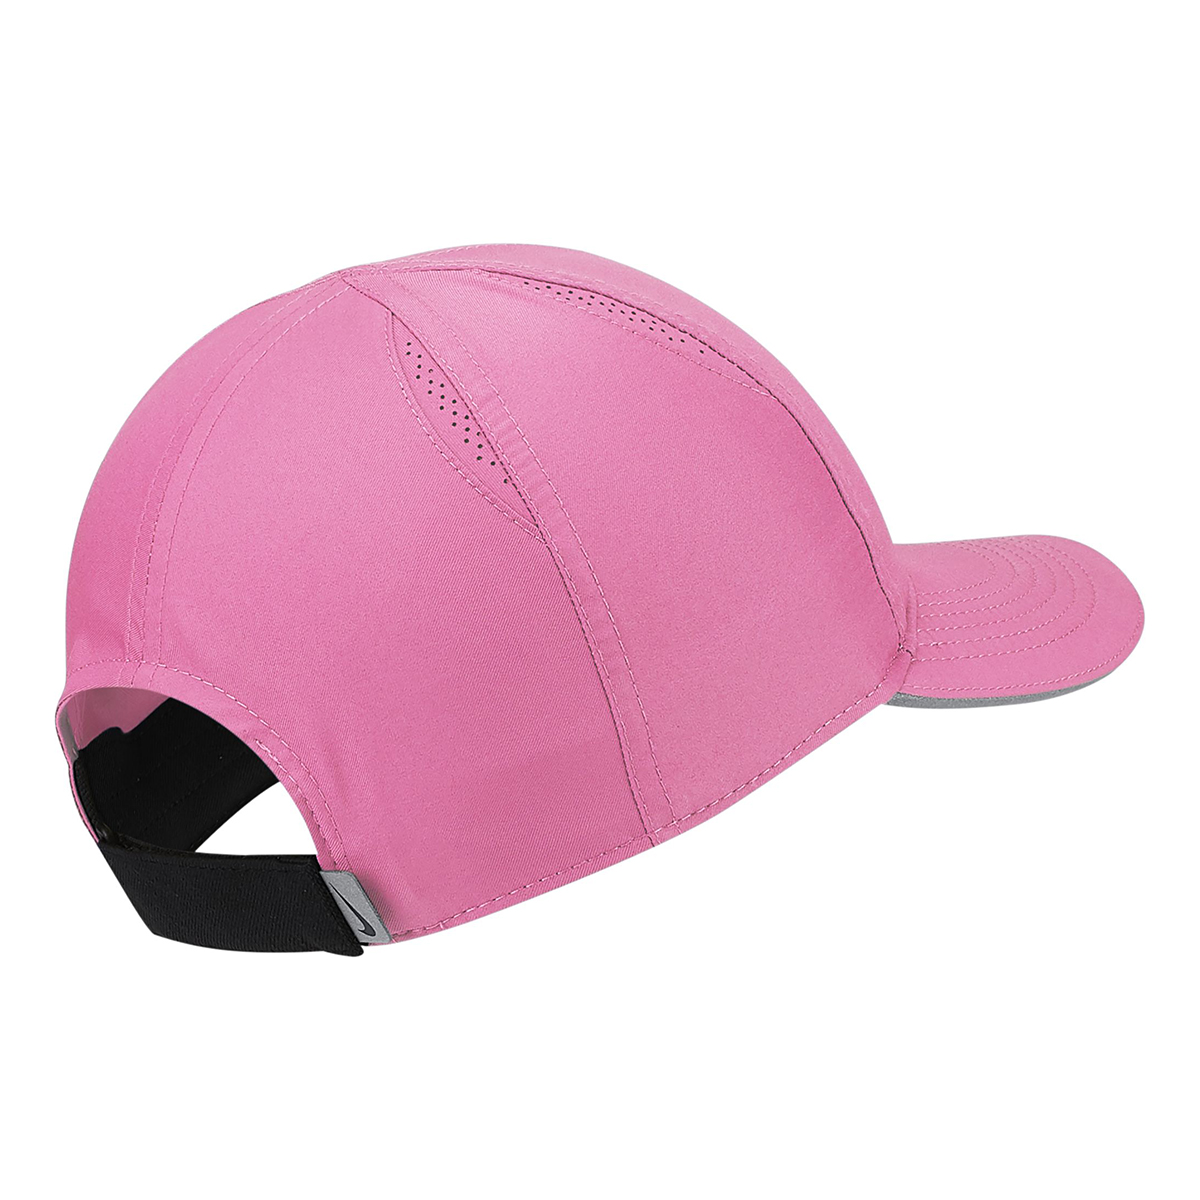 Women's Nike Featherlight Run Cap - Color: Pink Glow - Size: OS, Pink Glow, large, image 2